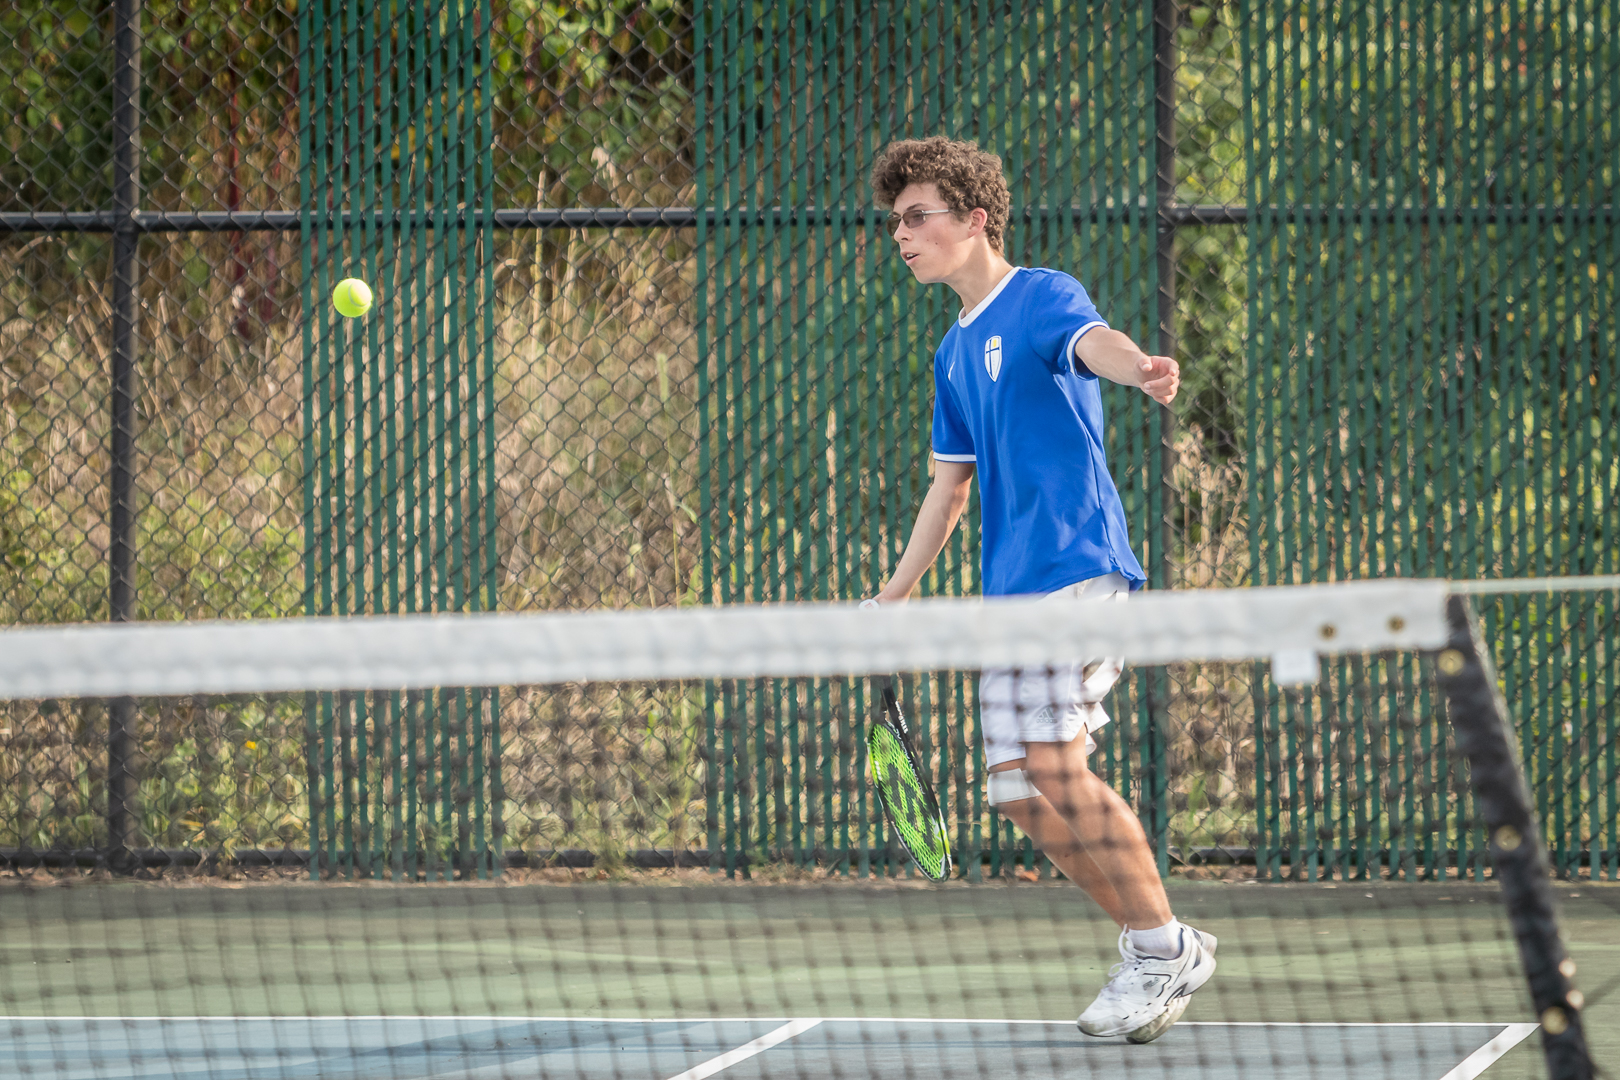 Marian-Boys-Tennis-1713.jpg